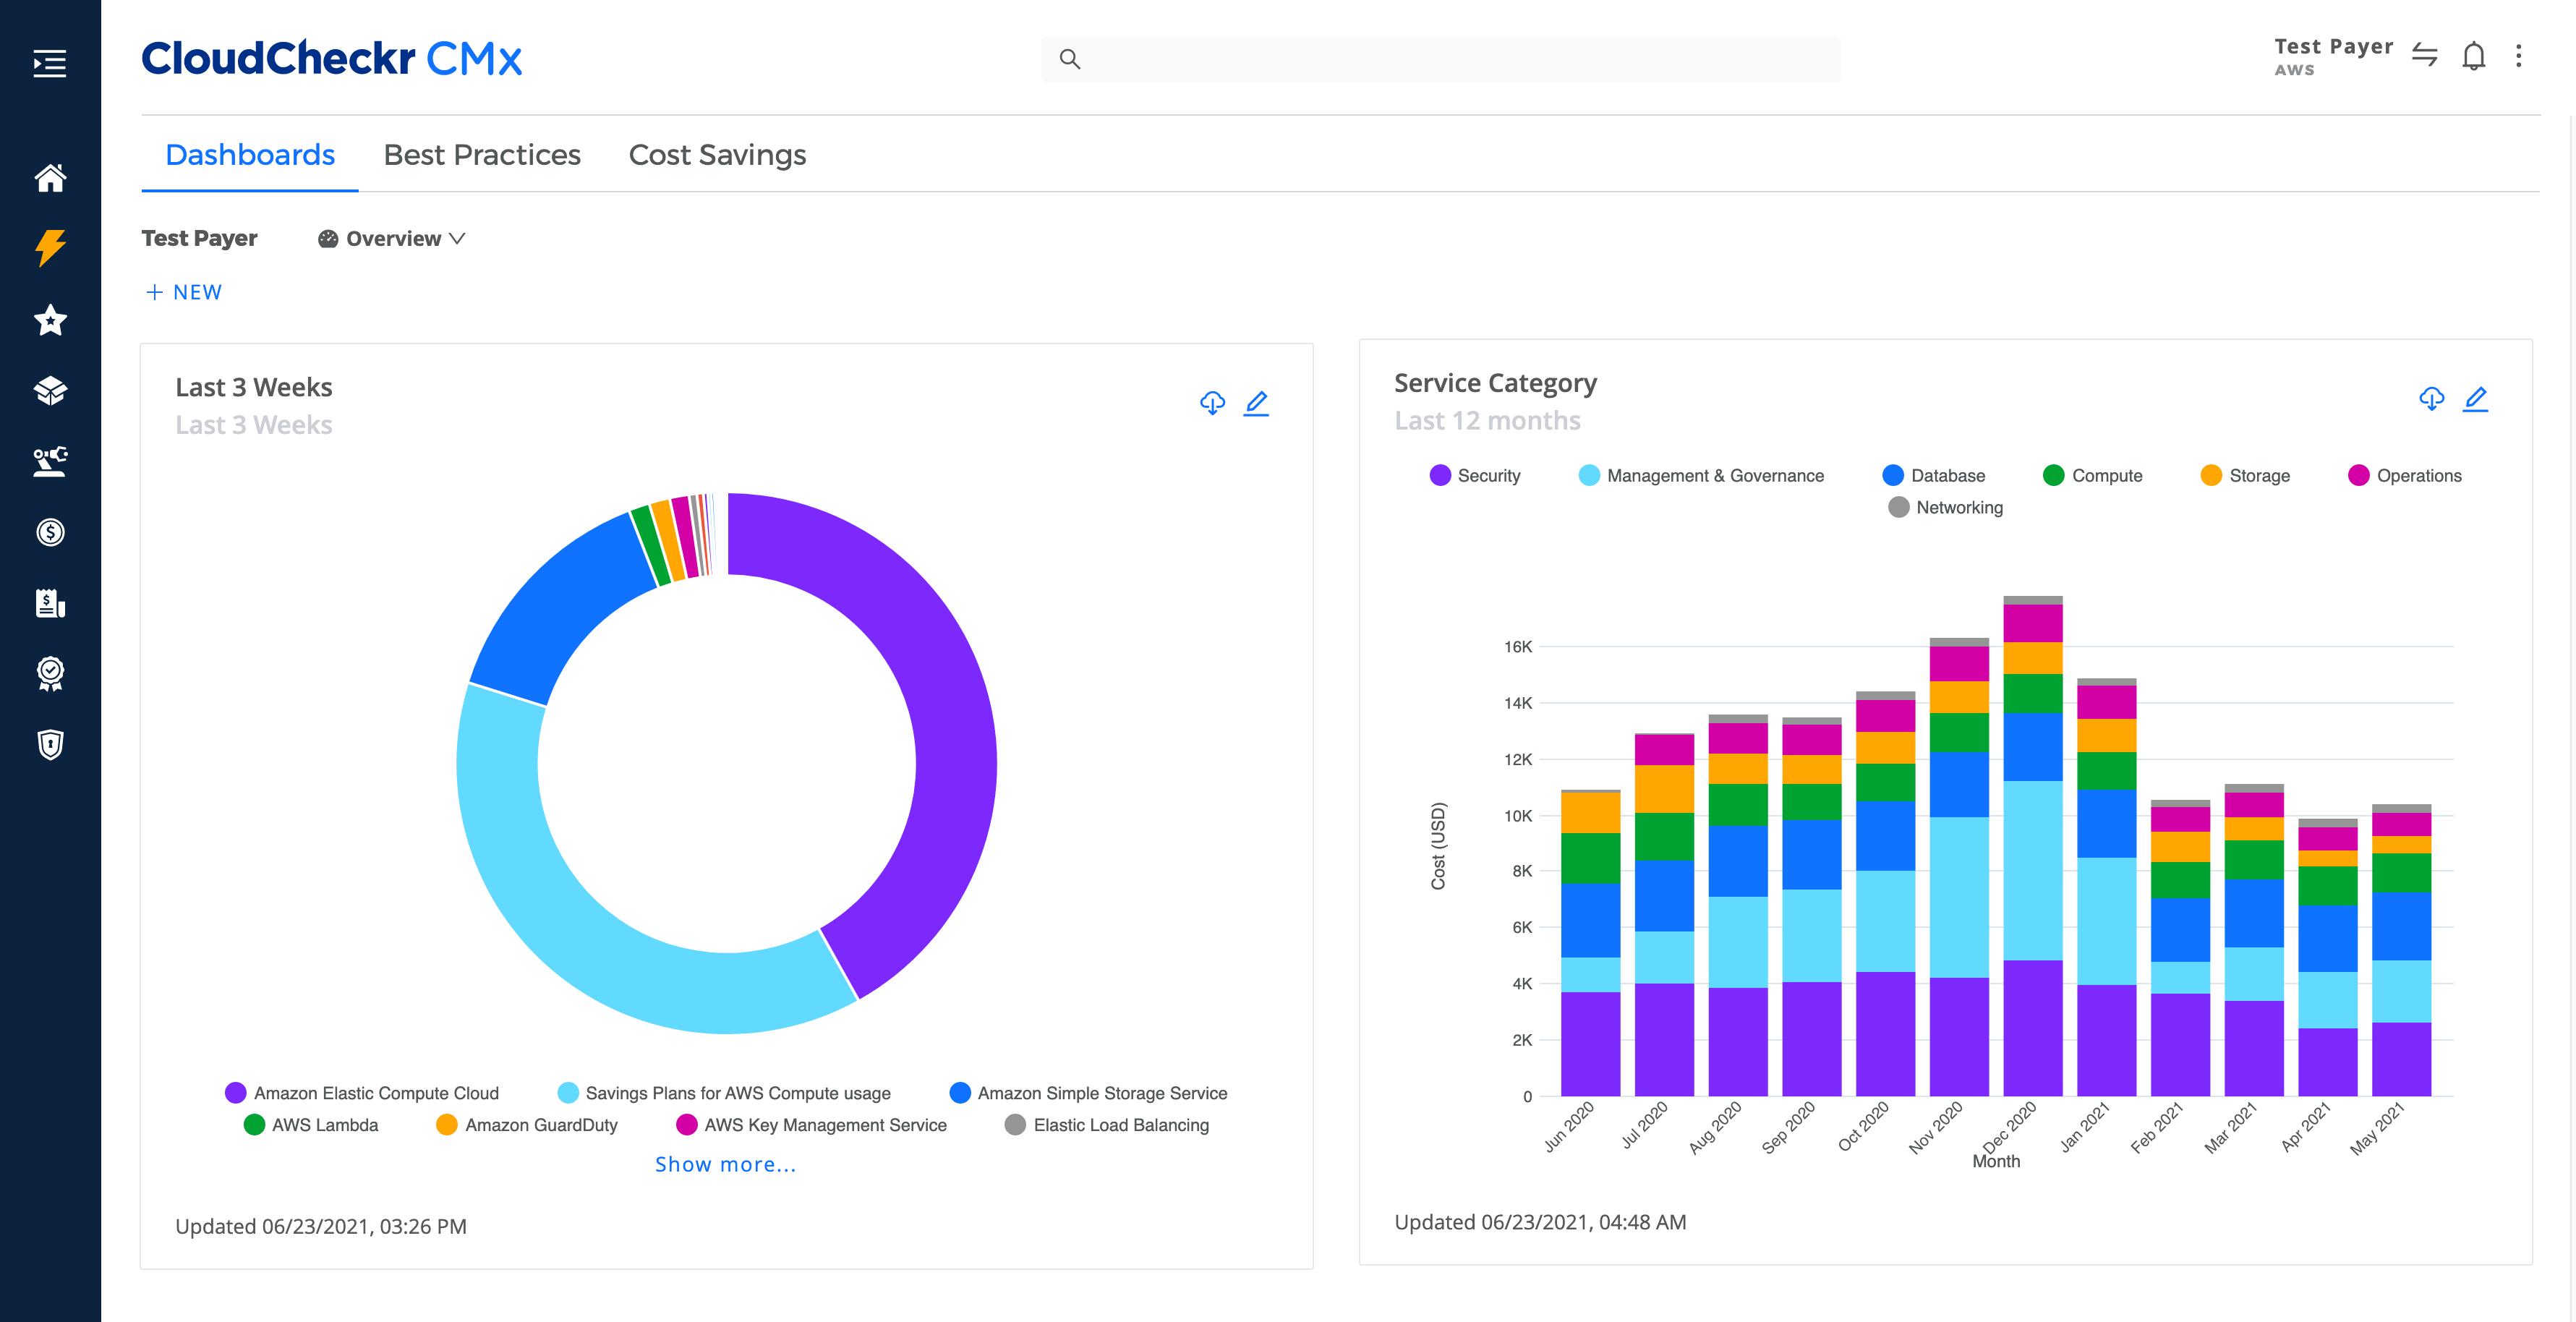 screenshot of the cloudcheckr cmx dashboard homepage